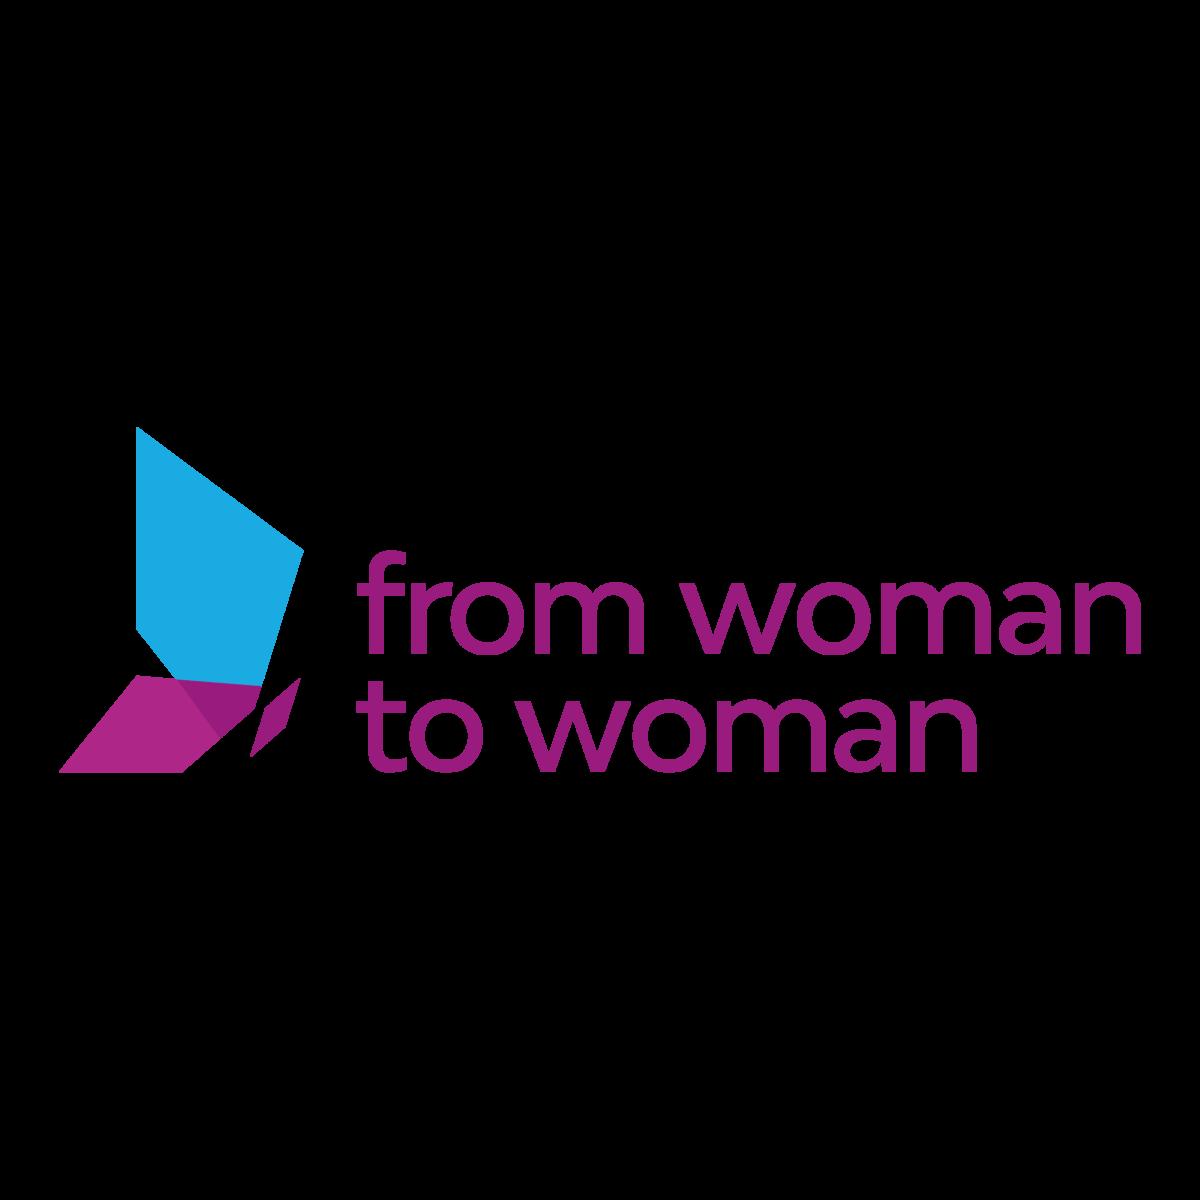 fromwomen